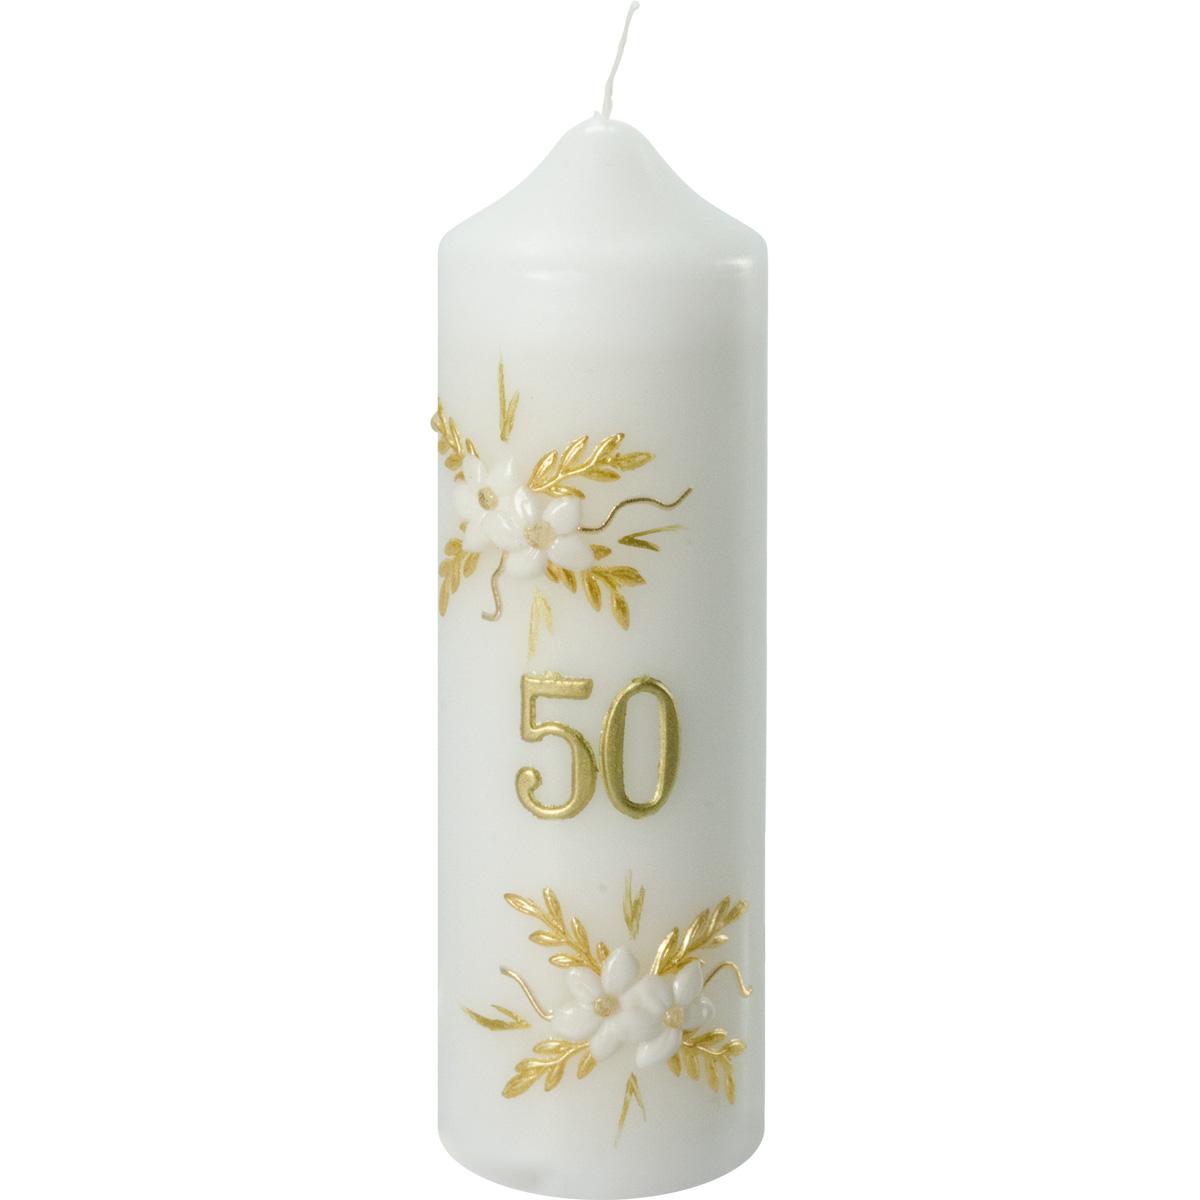 Goldene-Hochzeitskerze, #956, 165x50